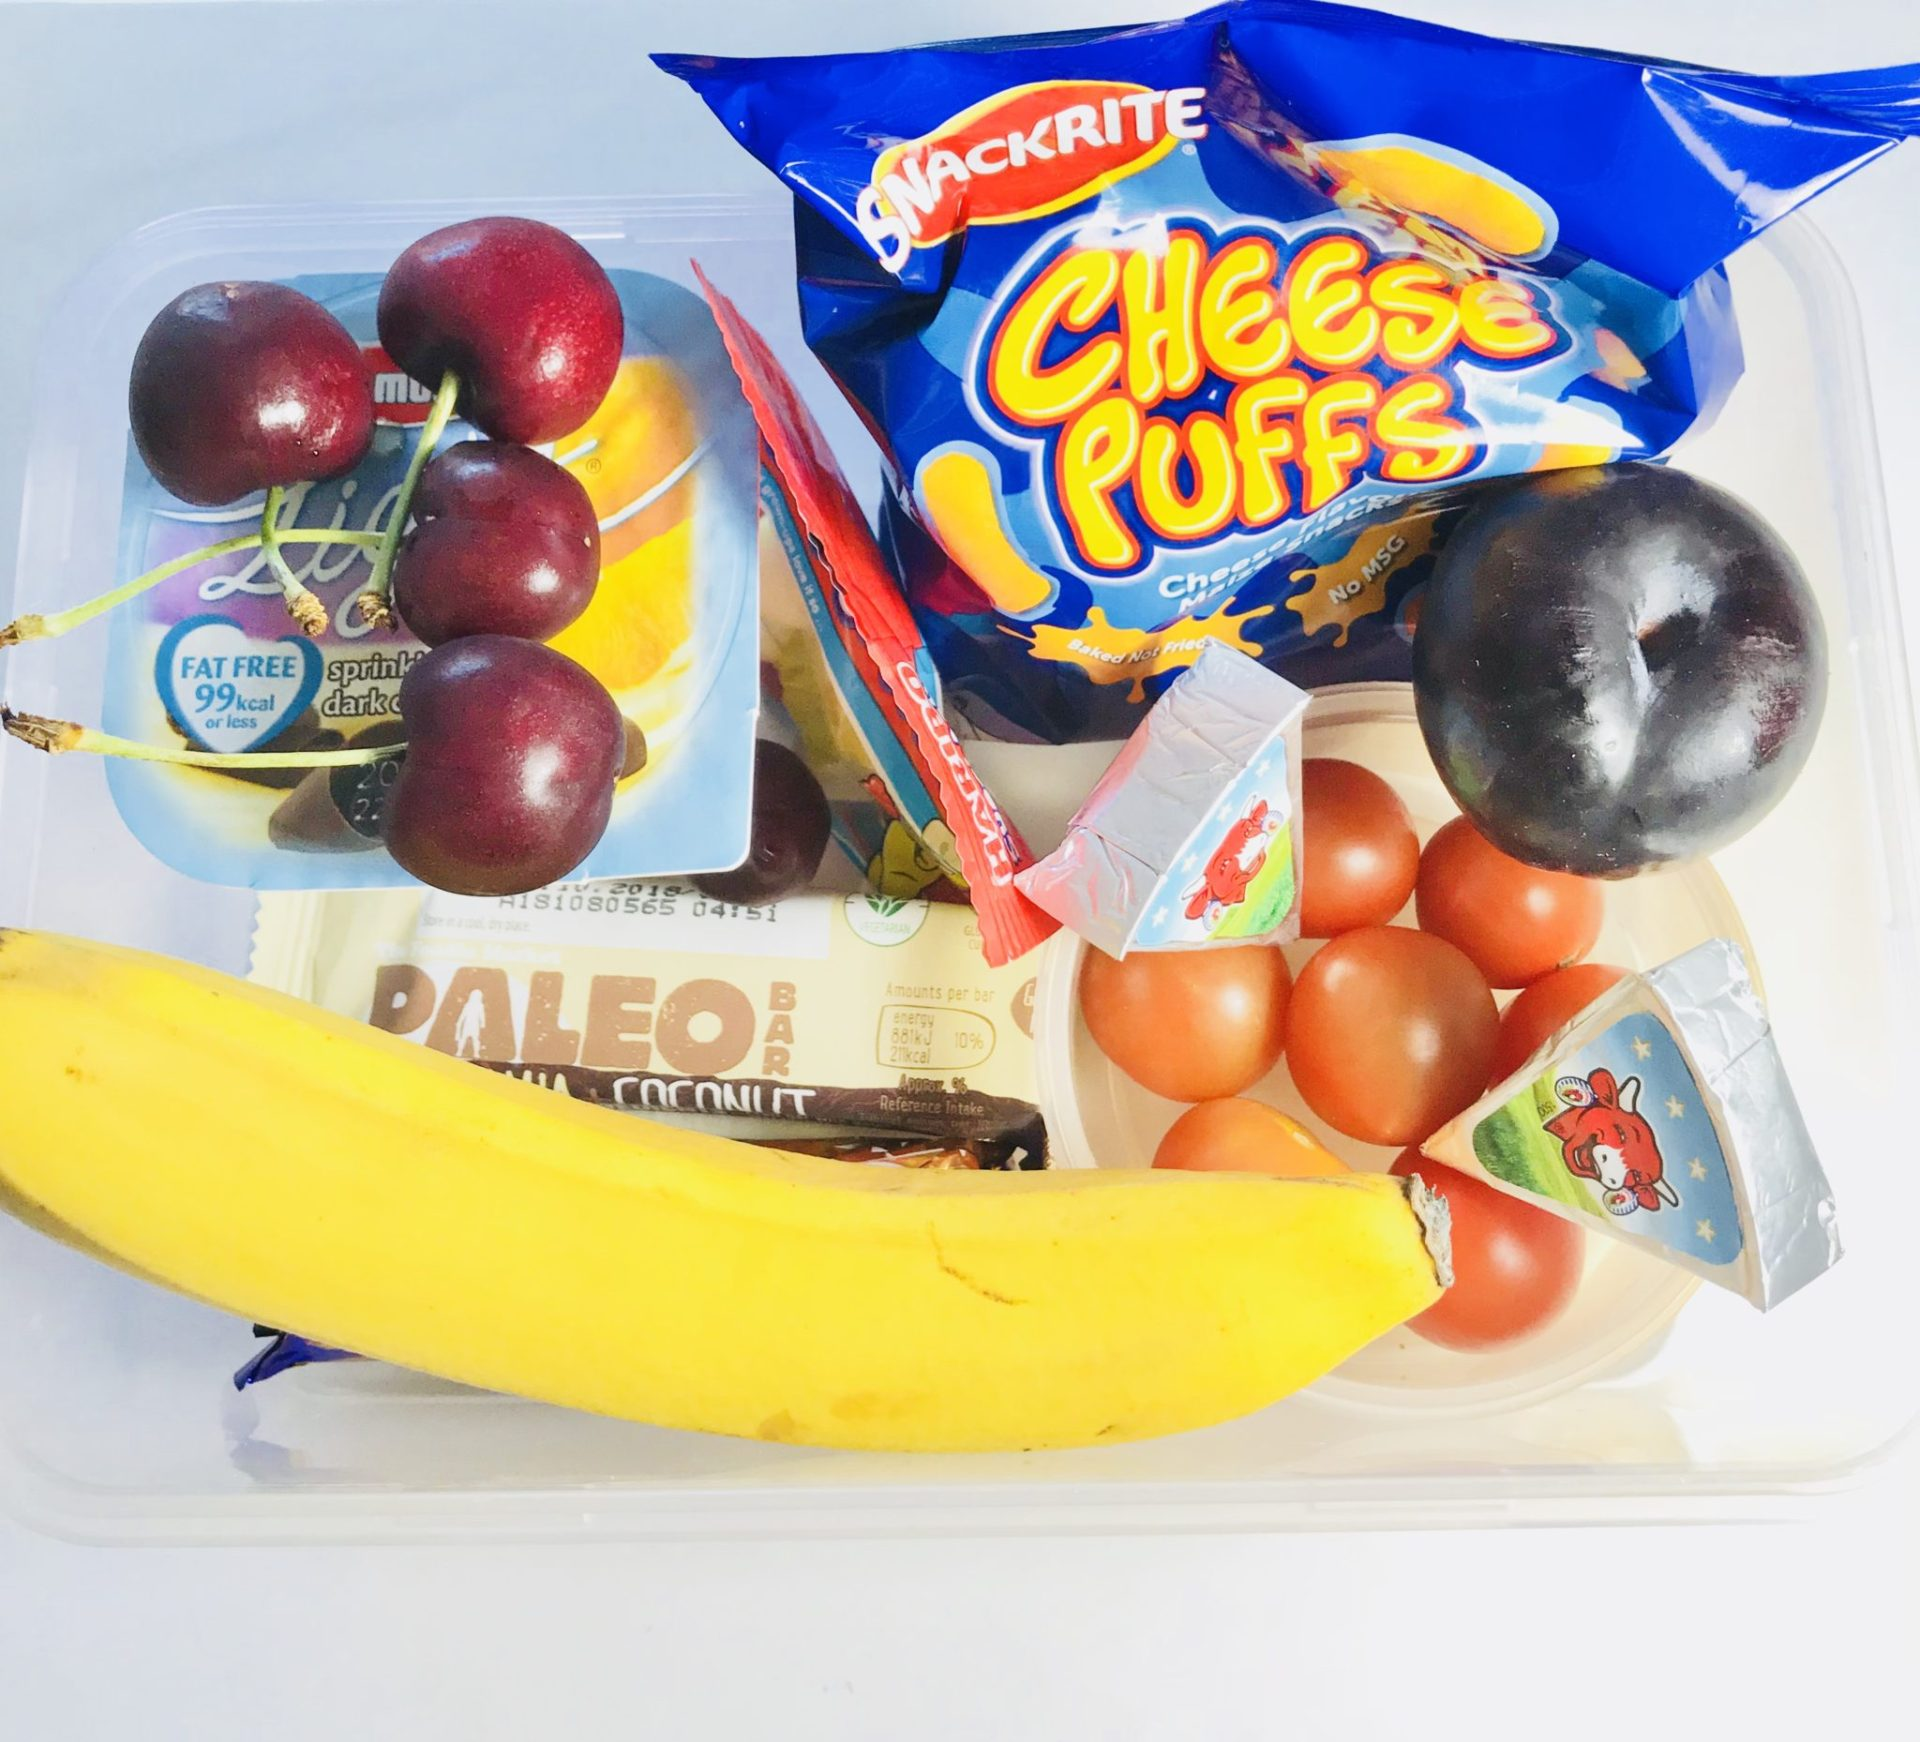 snack box idea crisps ,cherries, banana, cheese, fruit bar, cherry tomatoes yoghurt and a plum for kids snackbox